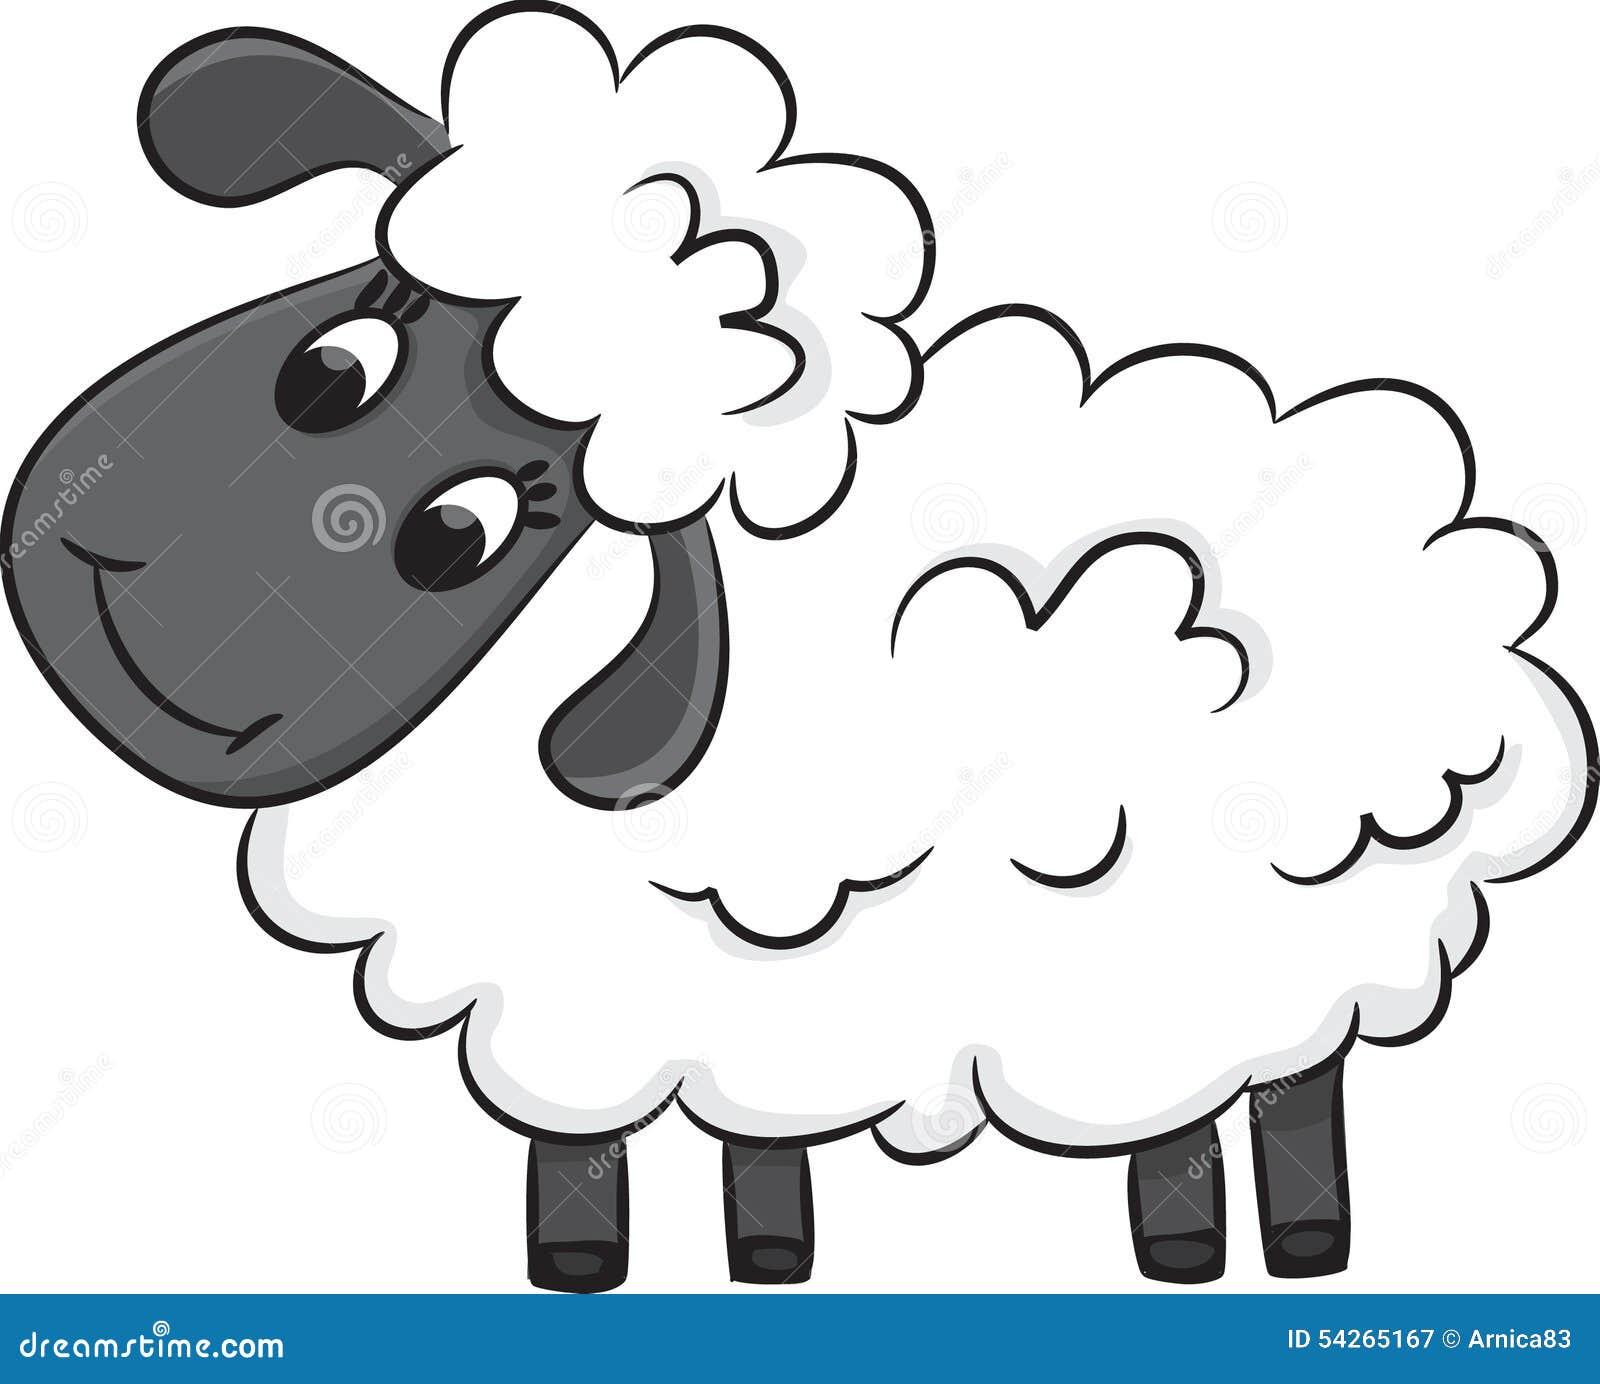 Cartoon Sheep Stock Vector Image 54265167